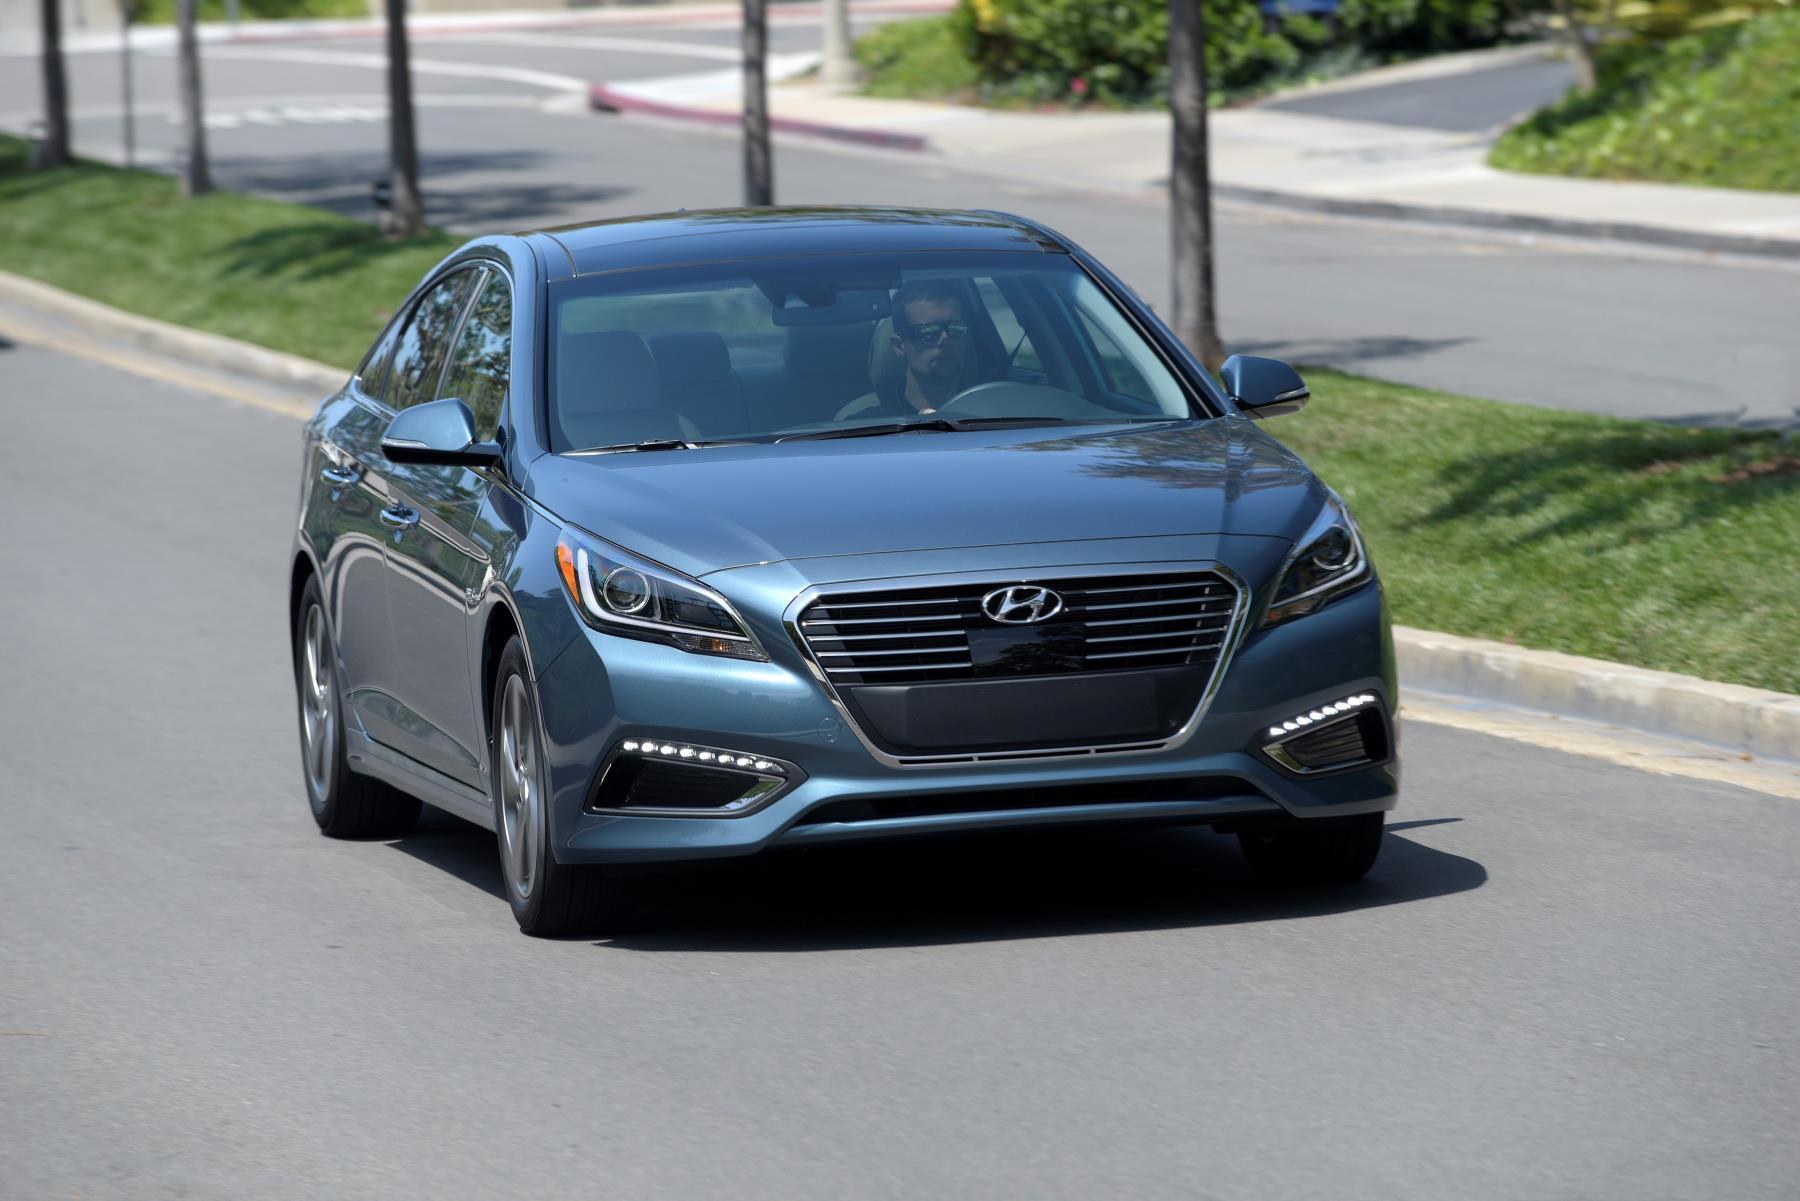 2017 Hyundai Sonata Plug-in Hybrid Offers 27-Mile EV Range ...